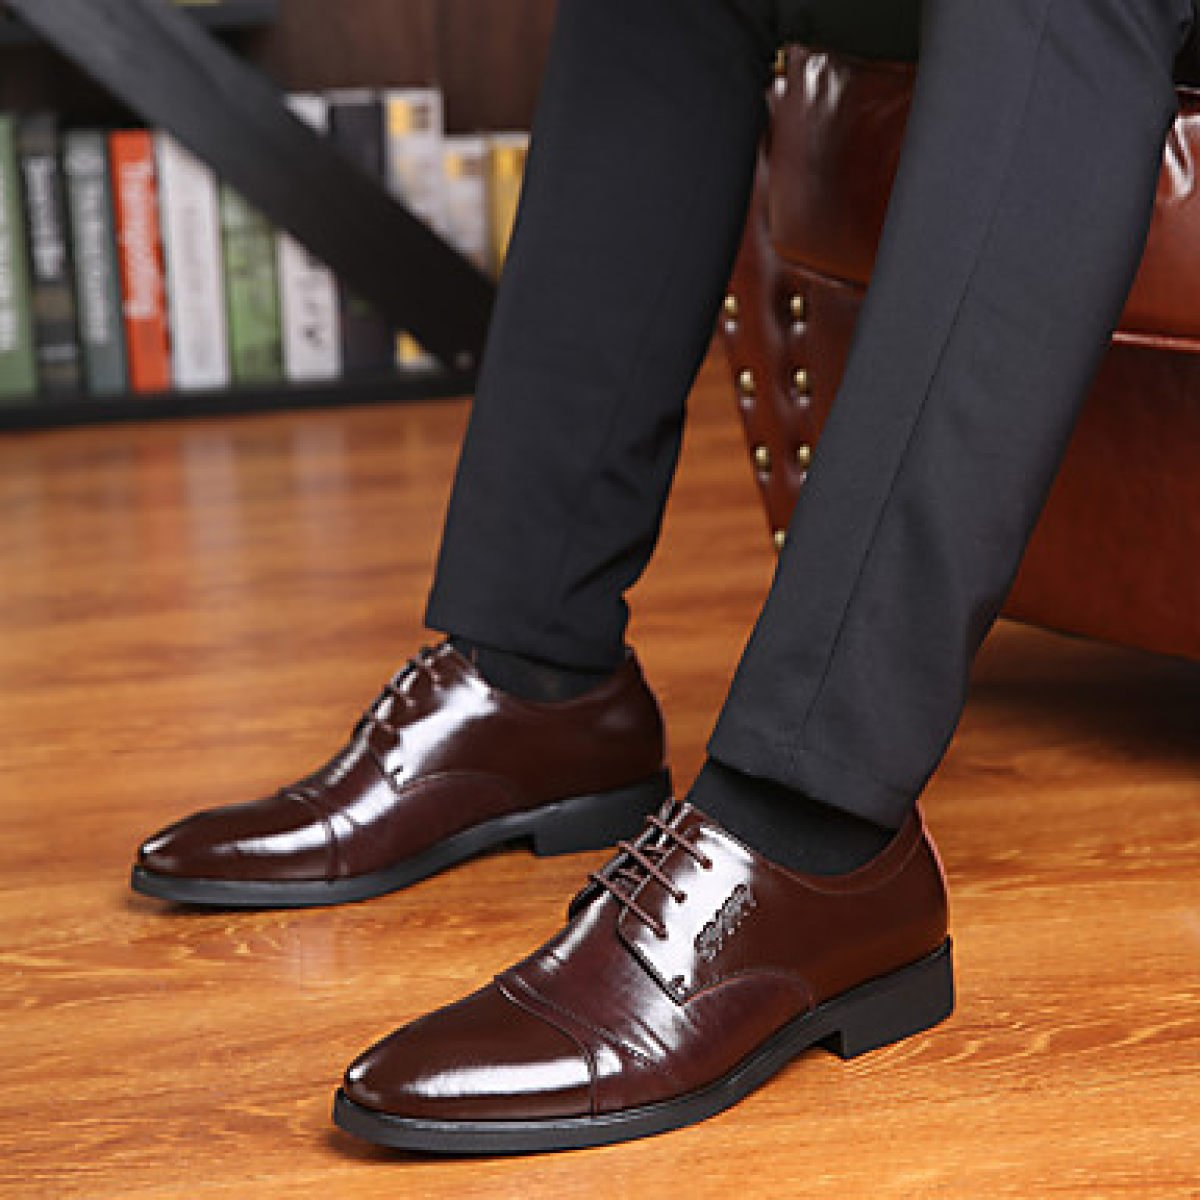 Herren Big Halbschuhe Business Style Big Herren Größe Büro Karriere Casual d0a1bd